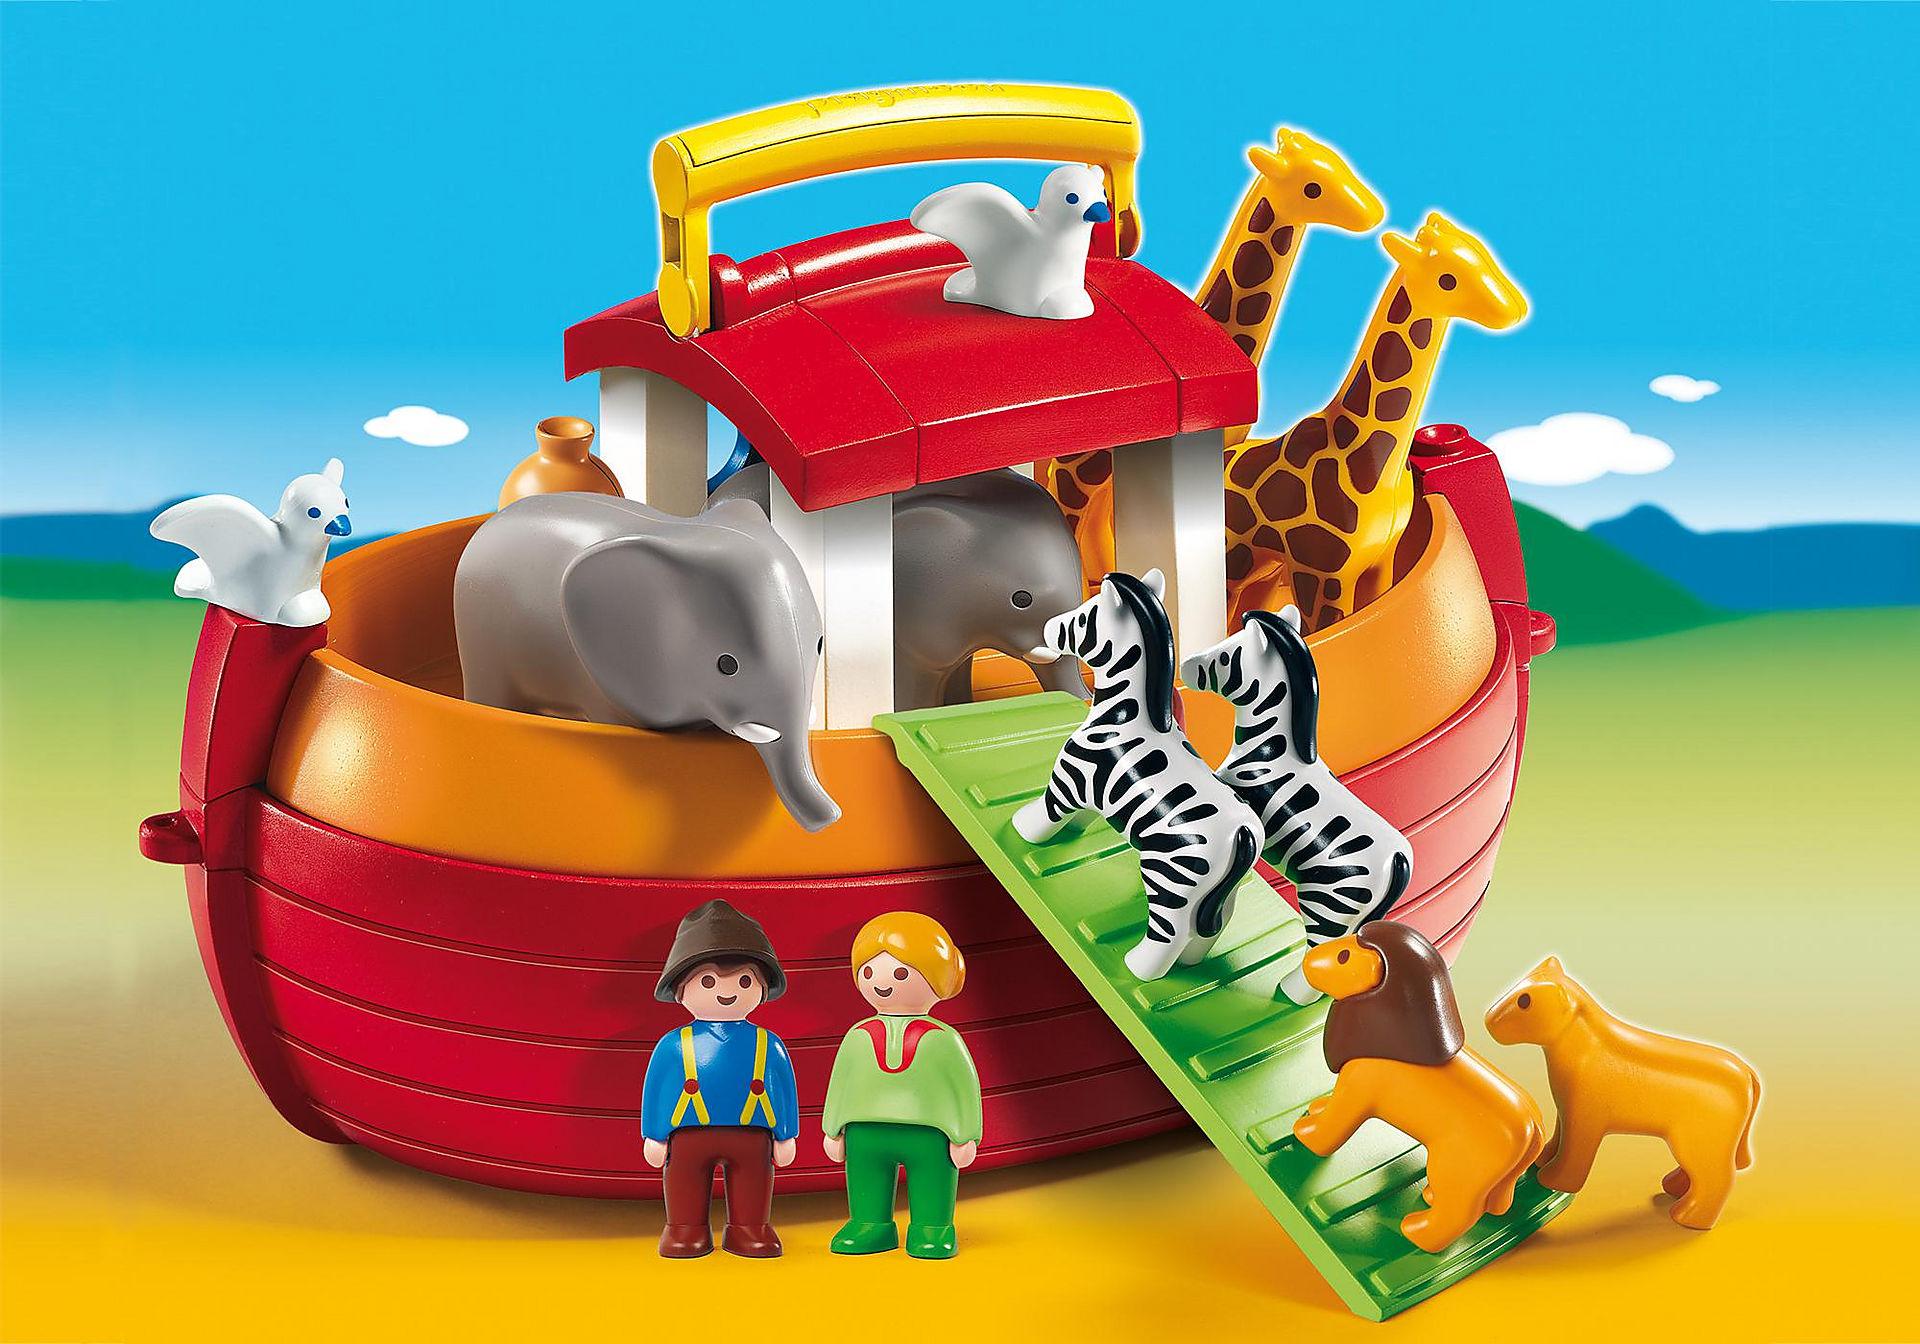 http://media.playmobil.com/i/playmobil/6765_product_detail/1.2.3 Arca de Noé Maletín